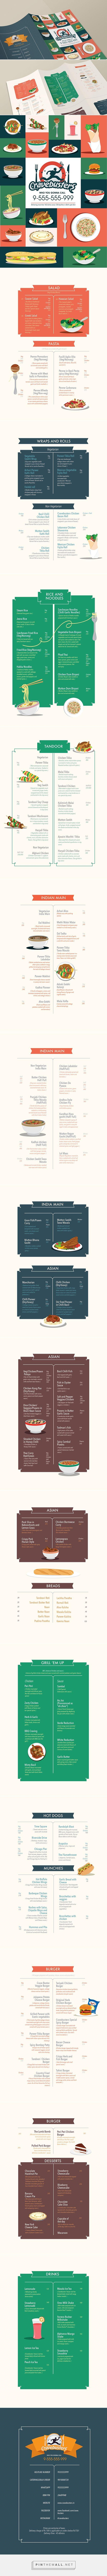 Cravebusters (Midnight food delivery) - Takeaway Menu by Ramsha Qamar